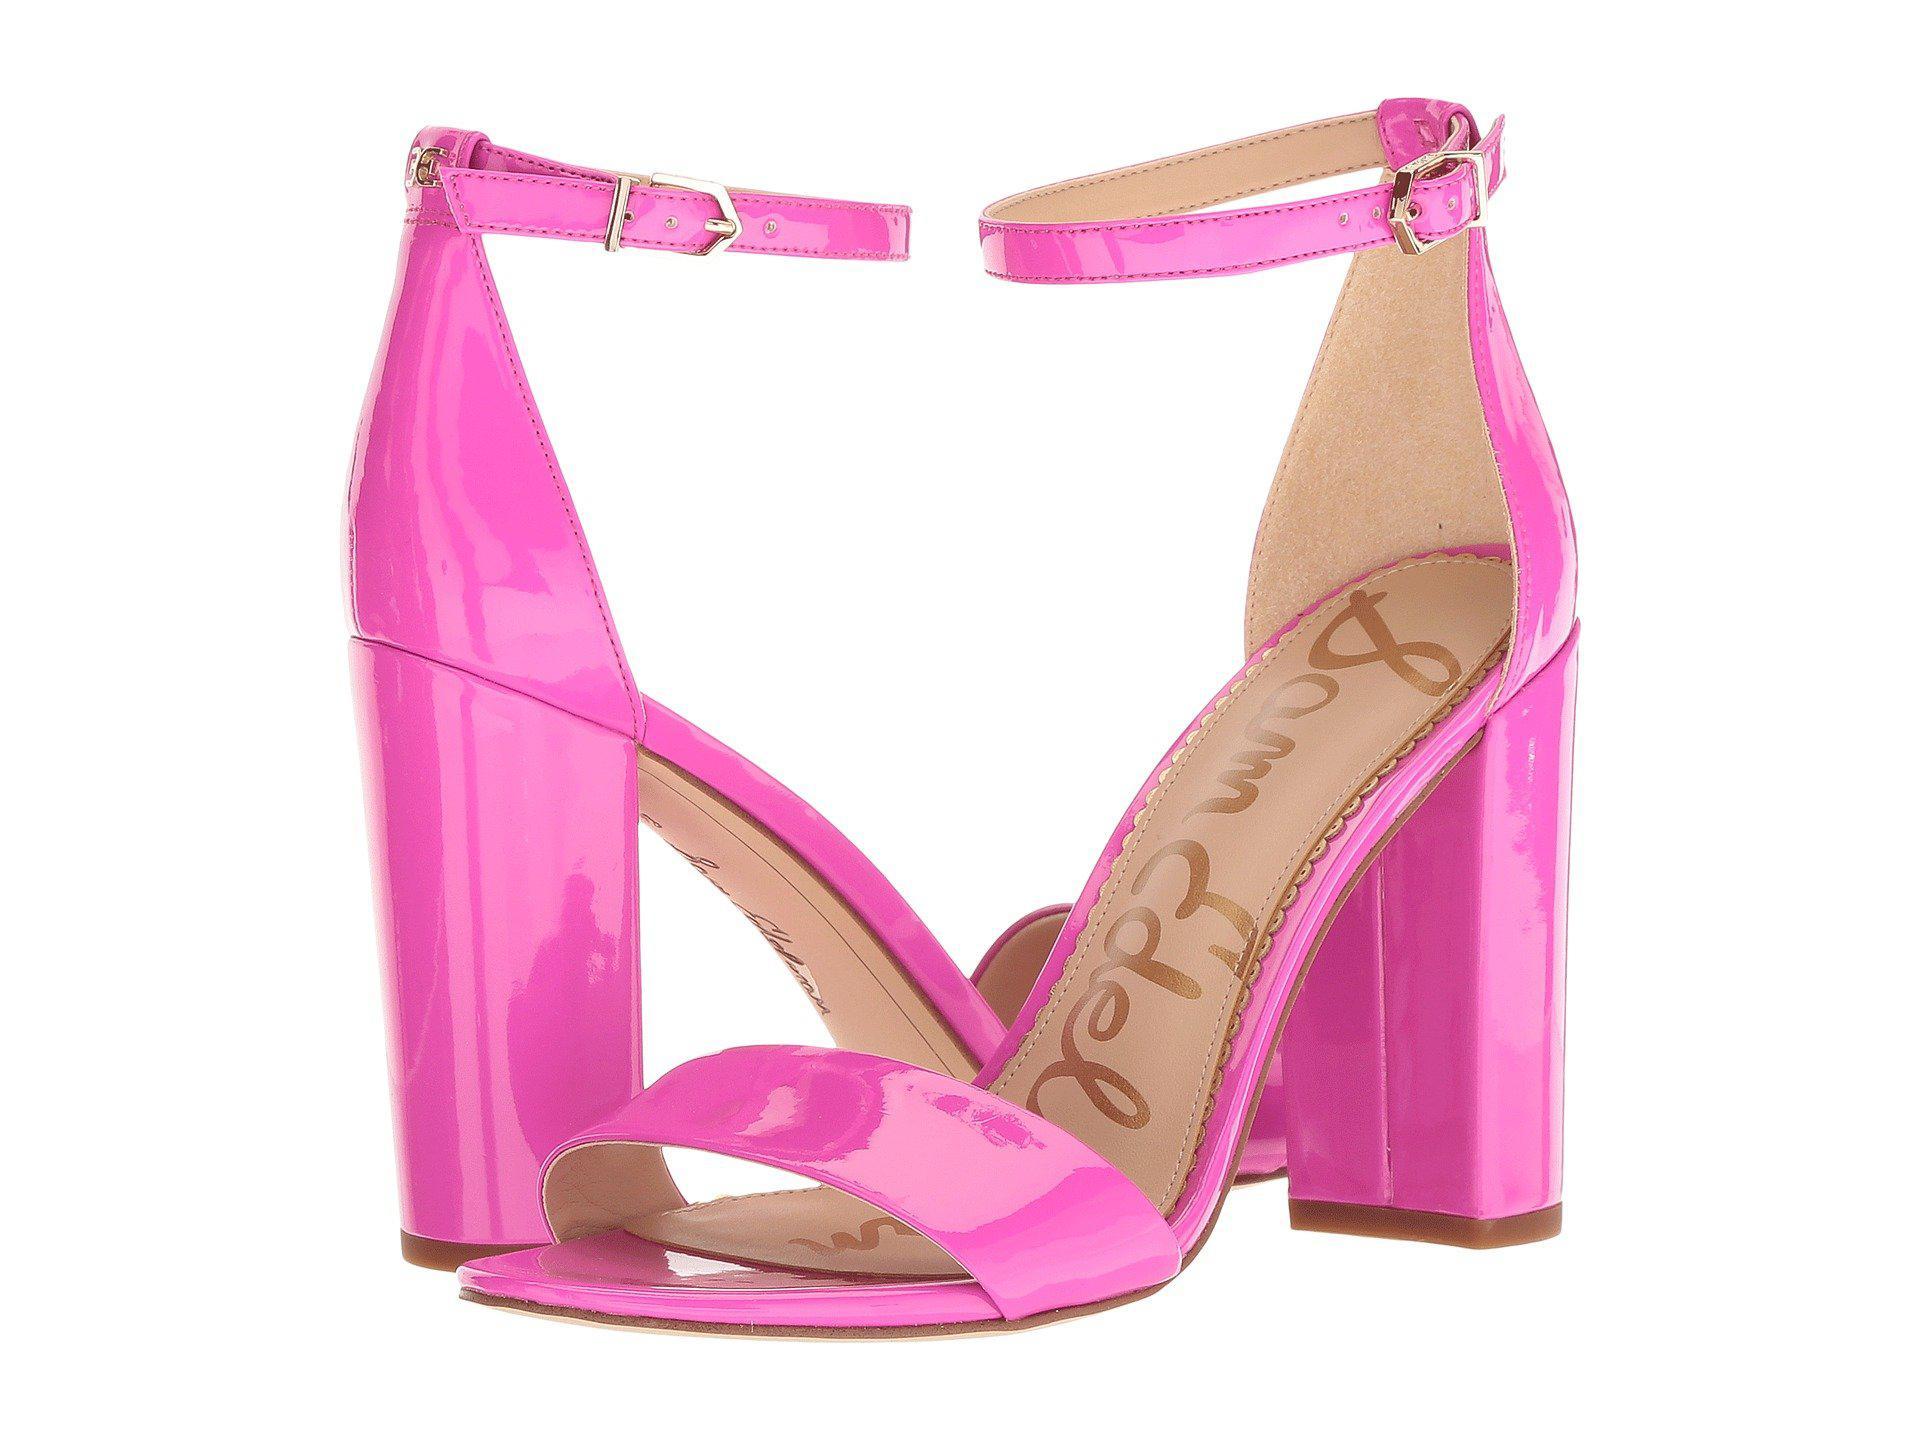 5e29199c4a78 Lyst - Sam Edelman Yaro Ankle Strap Sandal Heel in Pink